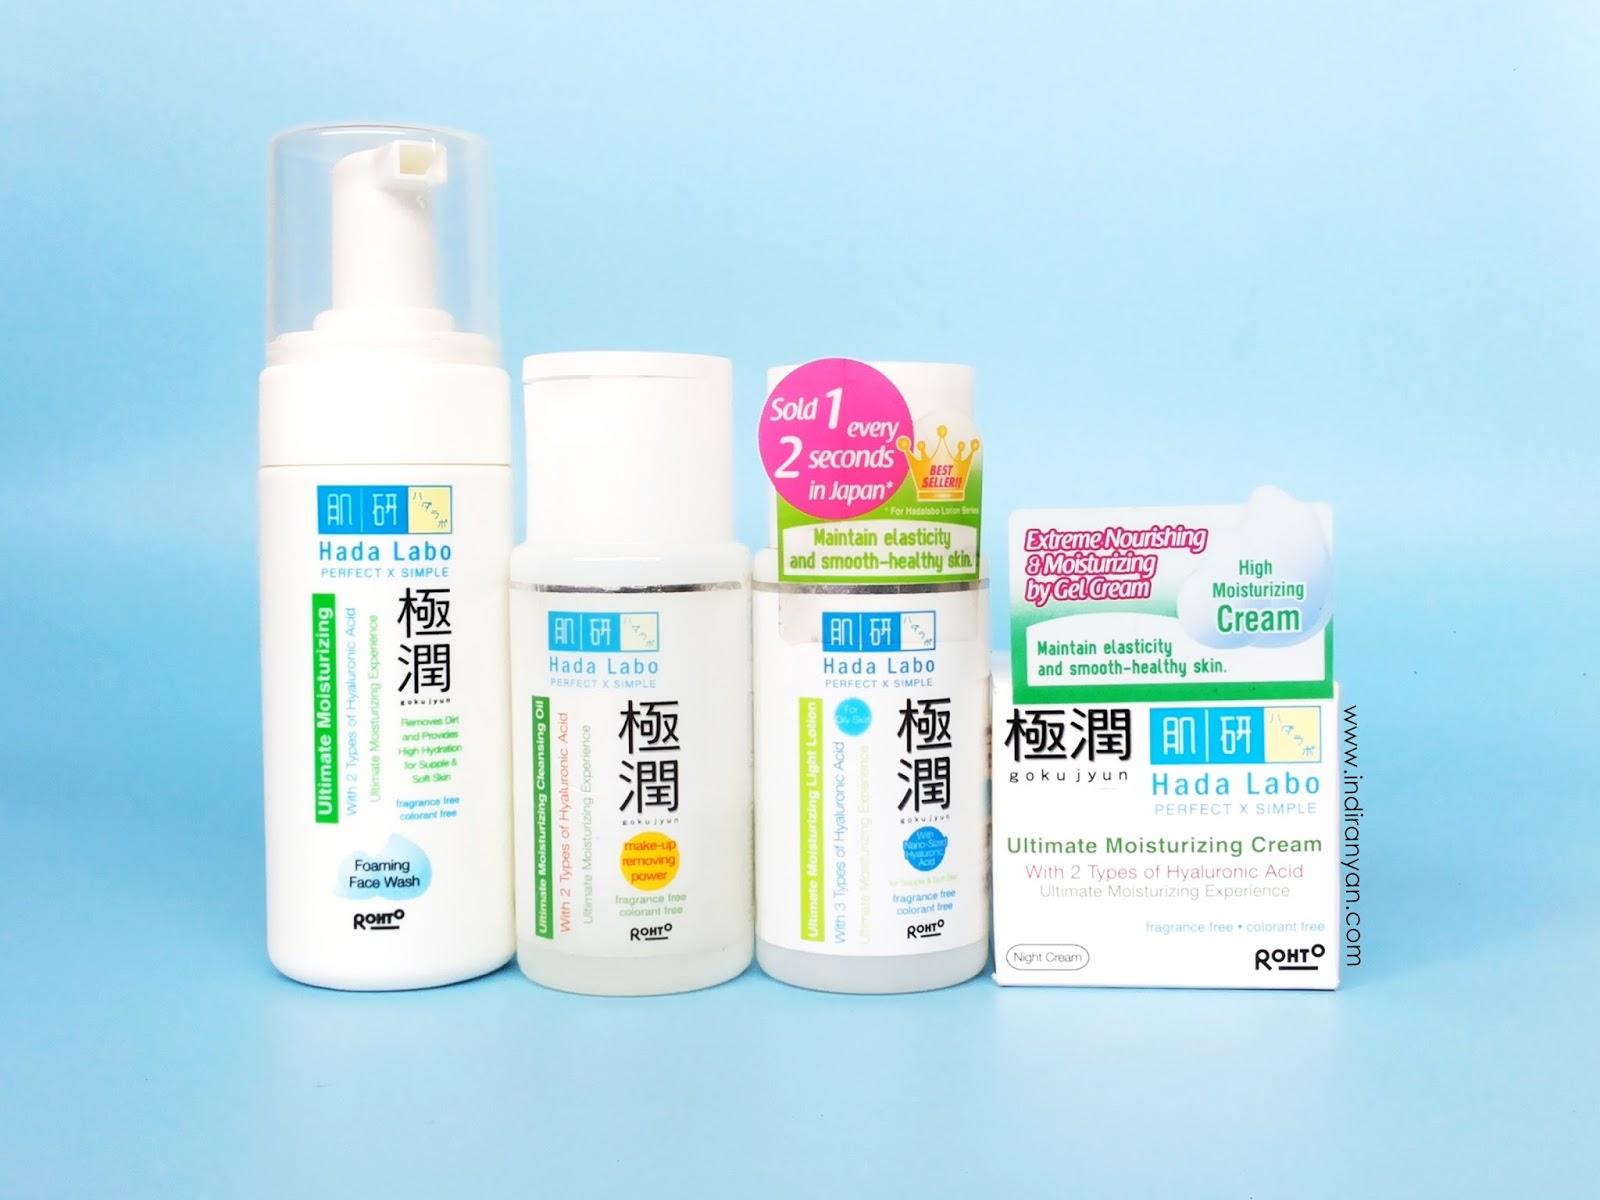 hadalabo-gokujyun-series, hadalabo-moisturizing-series, produk-hadalabo-untuk-melembabkan